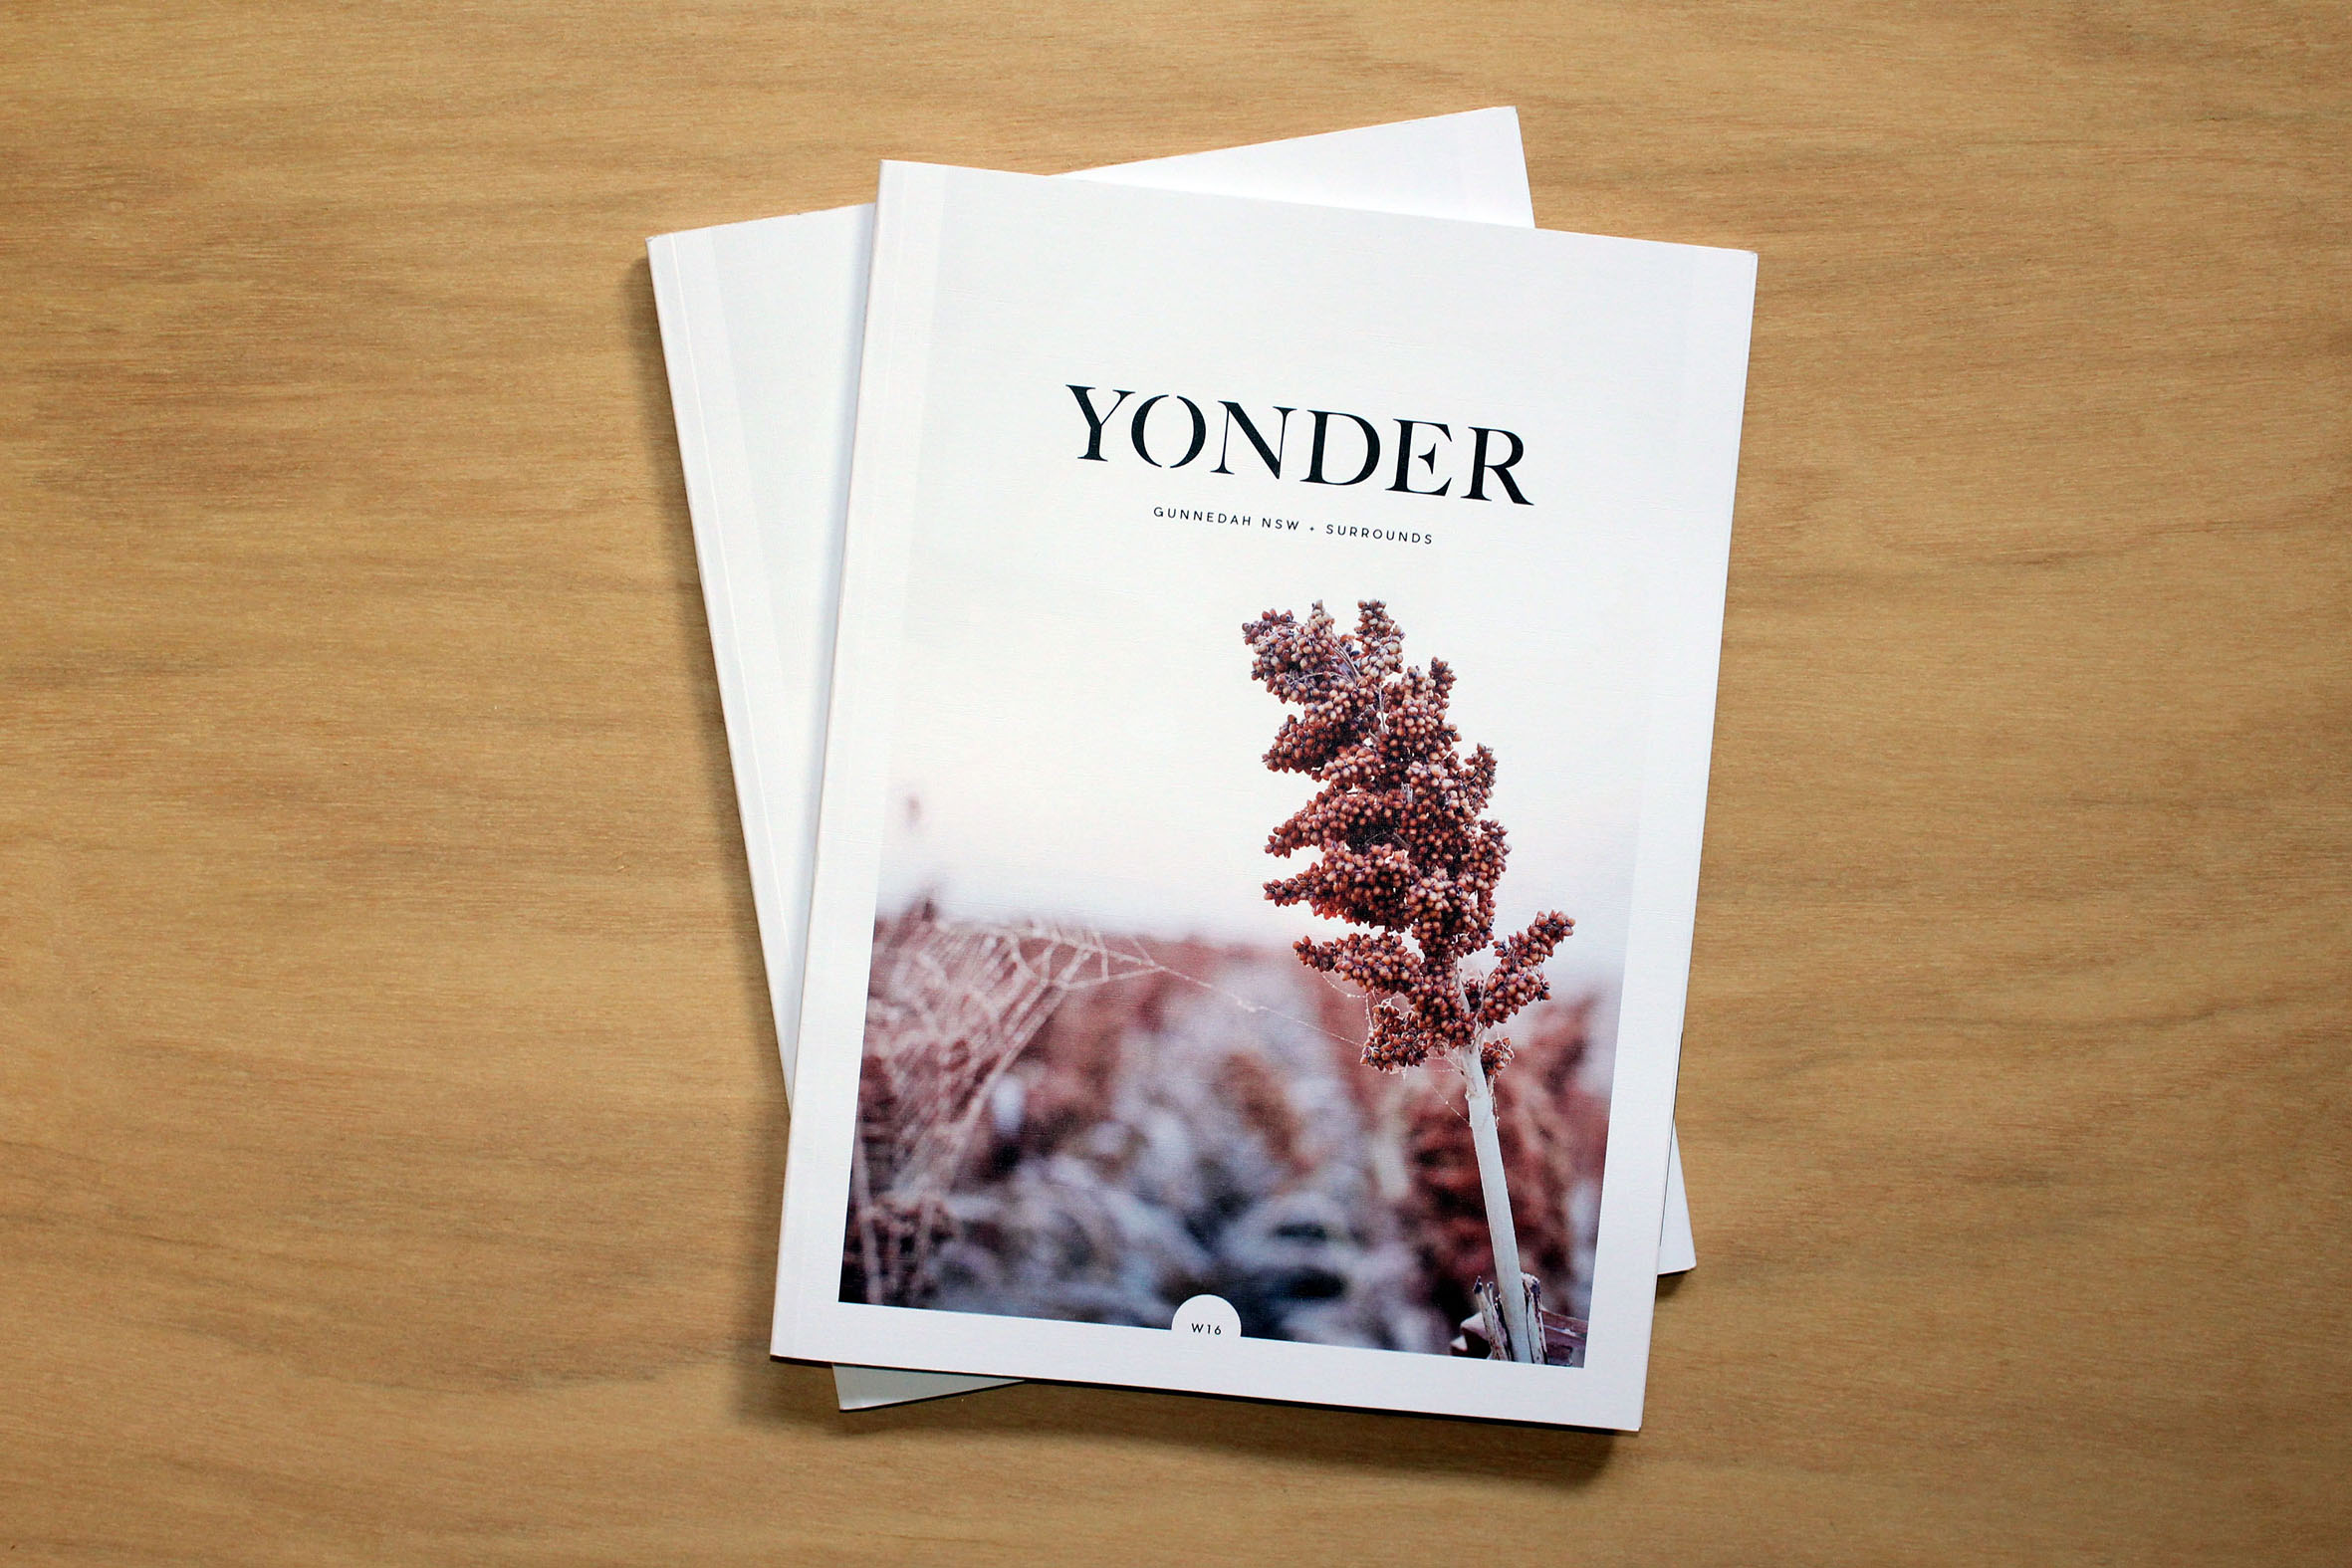 Yonder_cover_1w.jpg